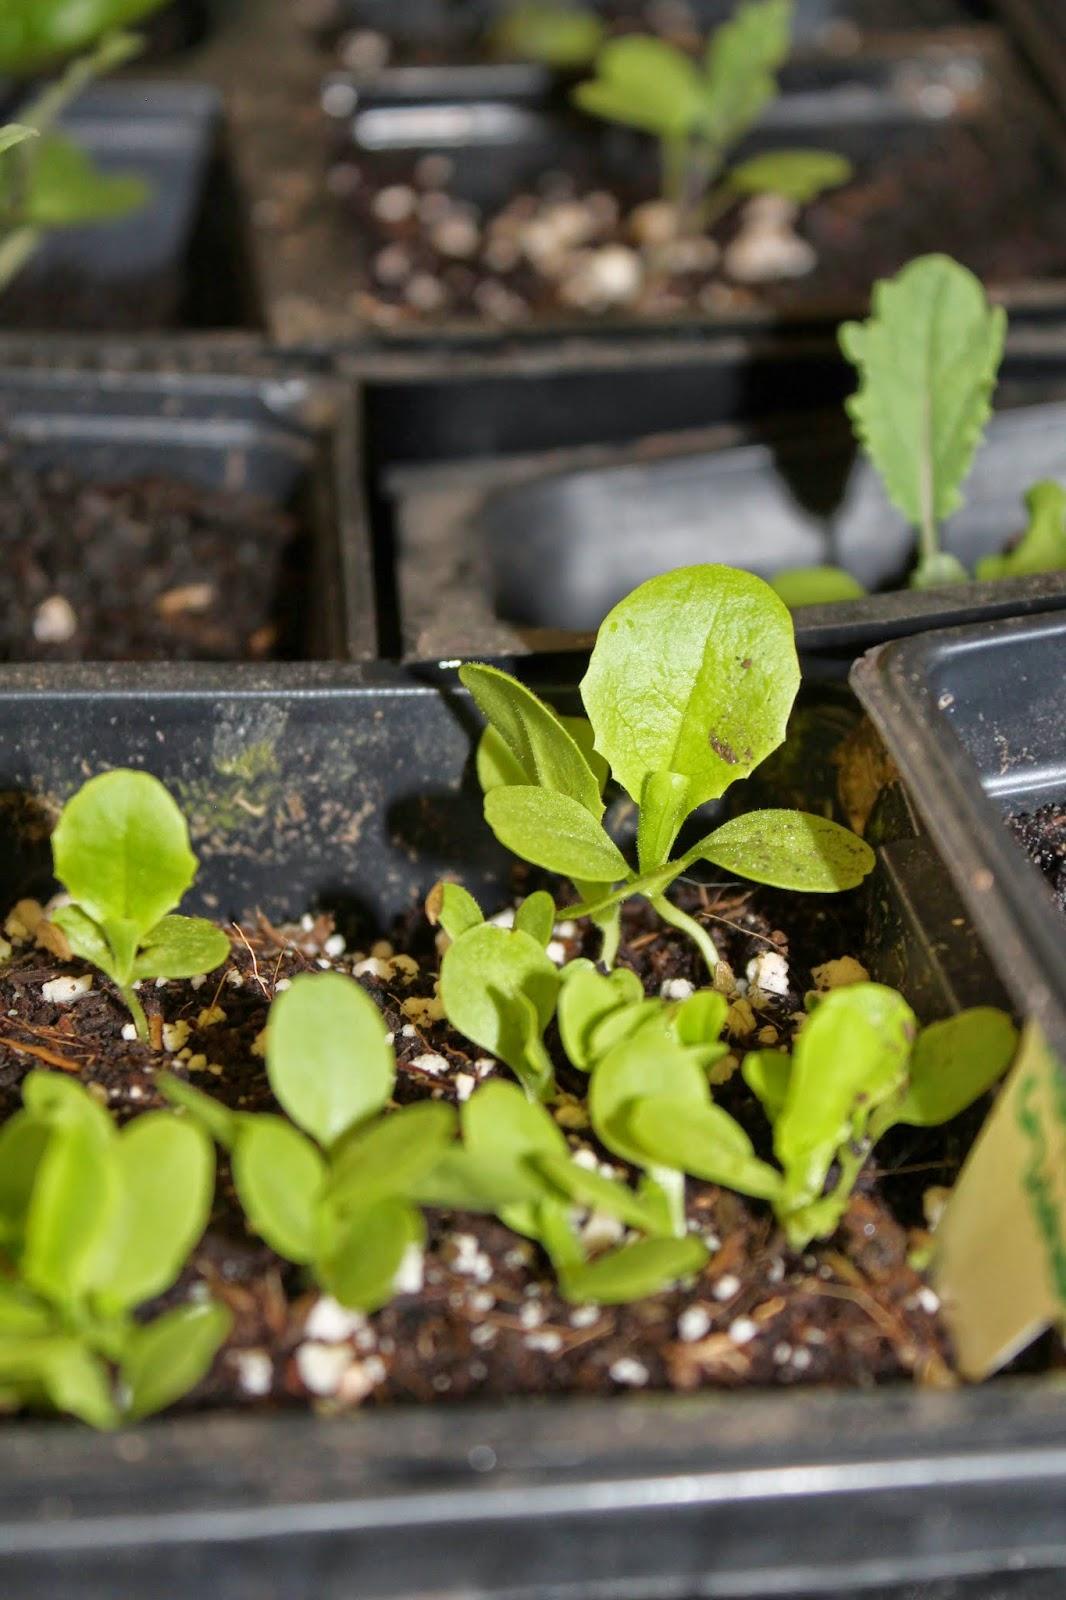 Kitchen Scrap Gardening Burnaby Food First Gardening Education Portal Gardening From